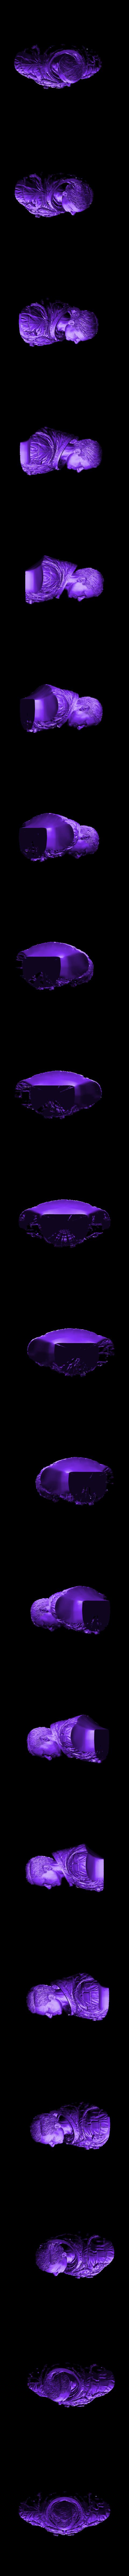 astronaut_bust_low.stl Download free STL file Astronaut Bust • 3D printing design, LSMiniatures